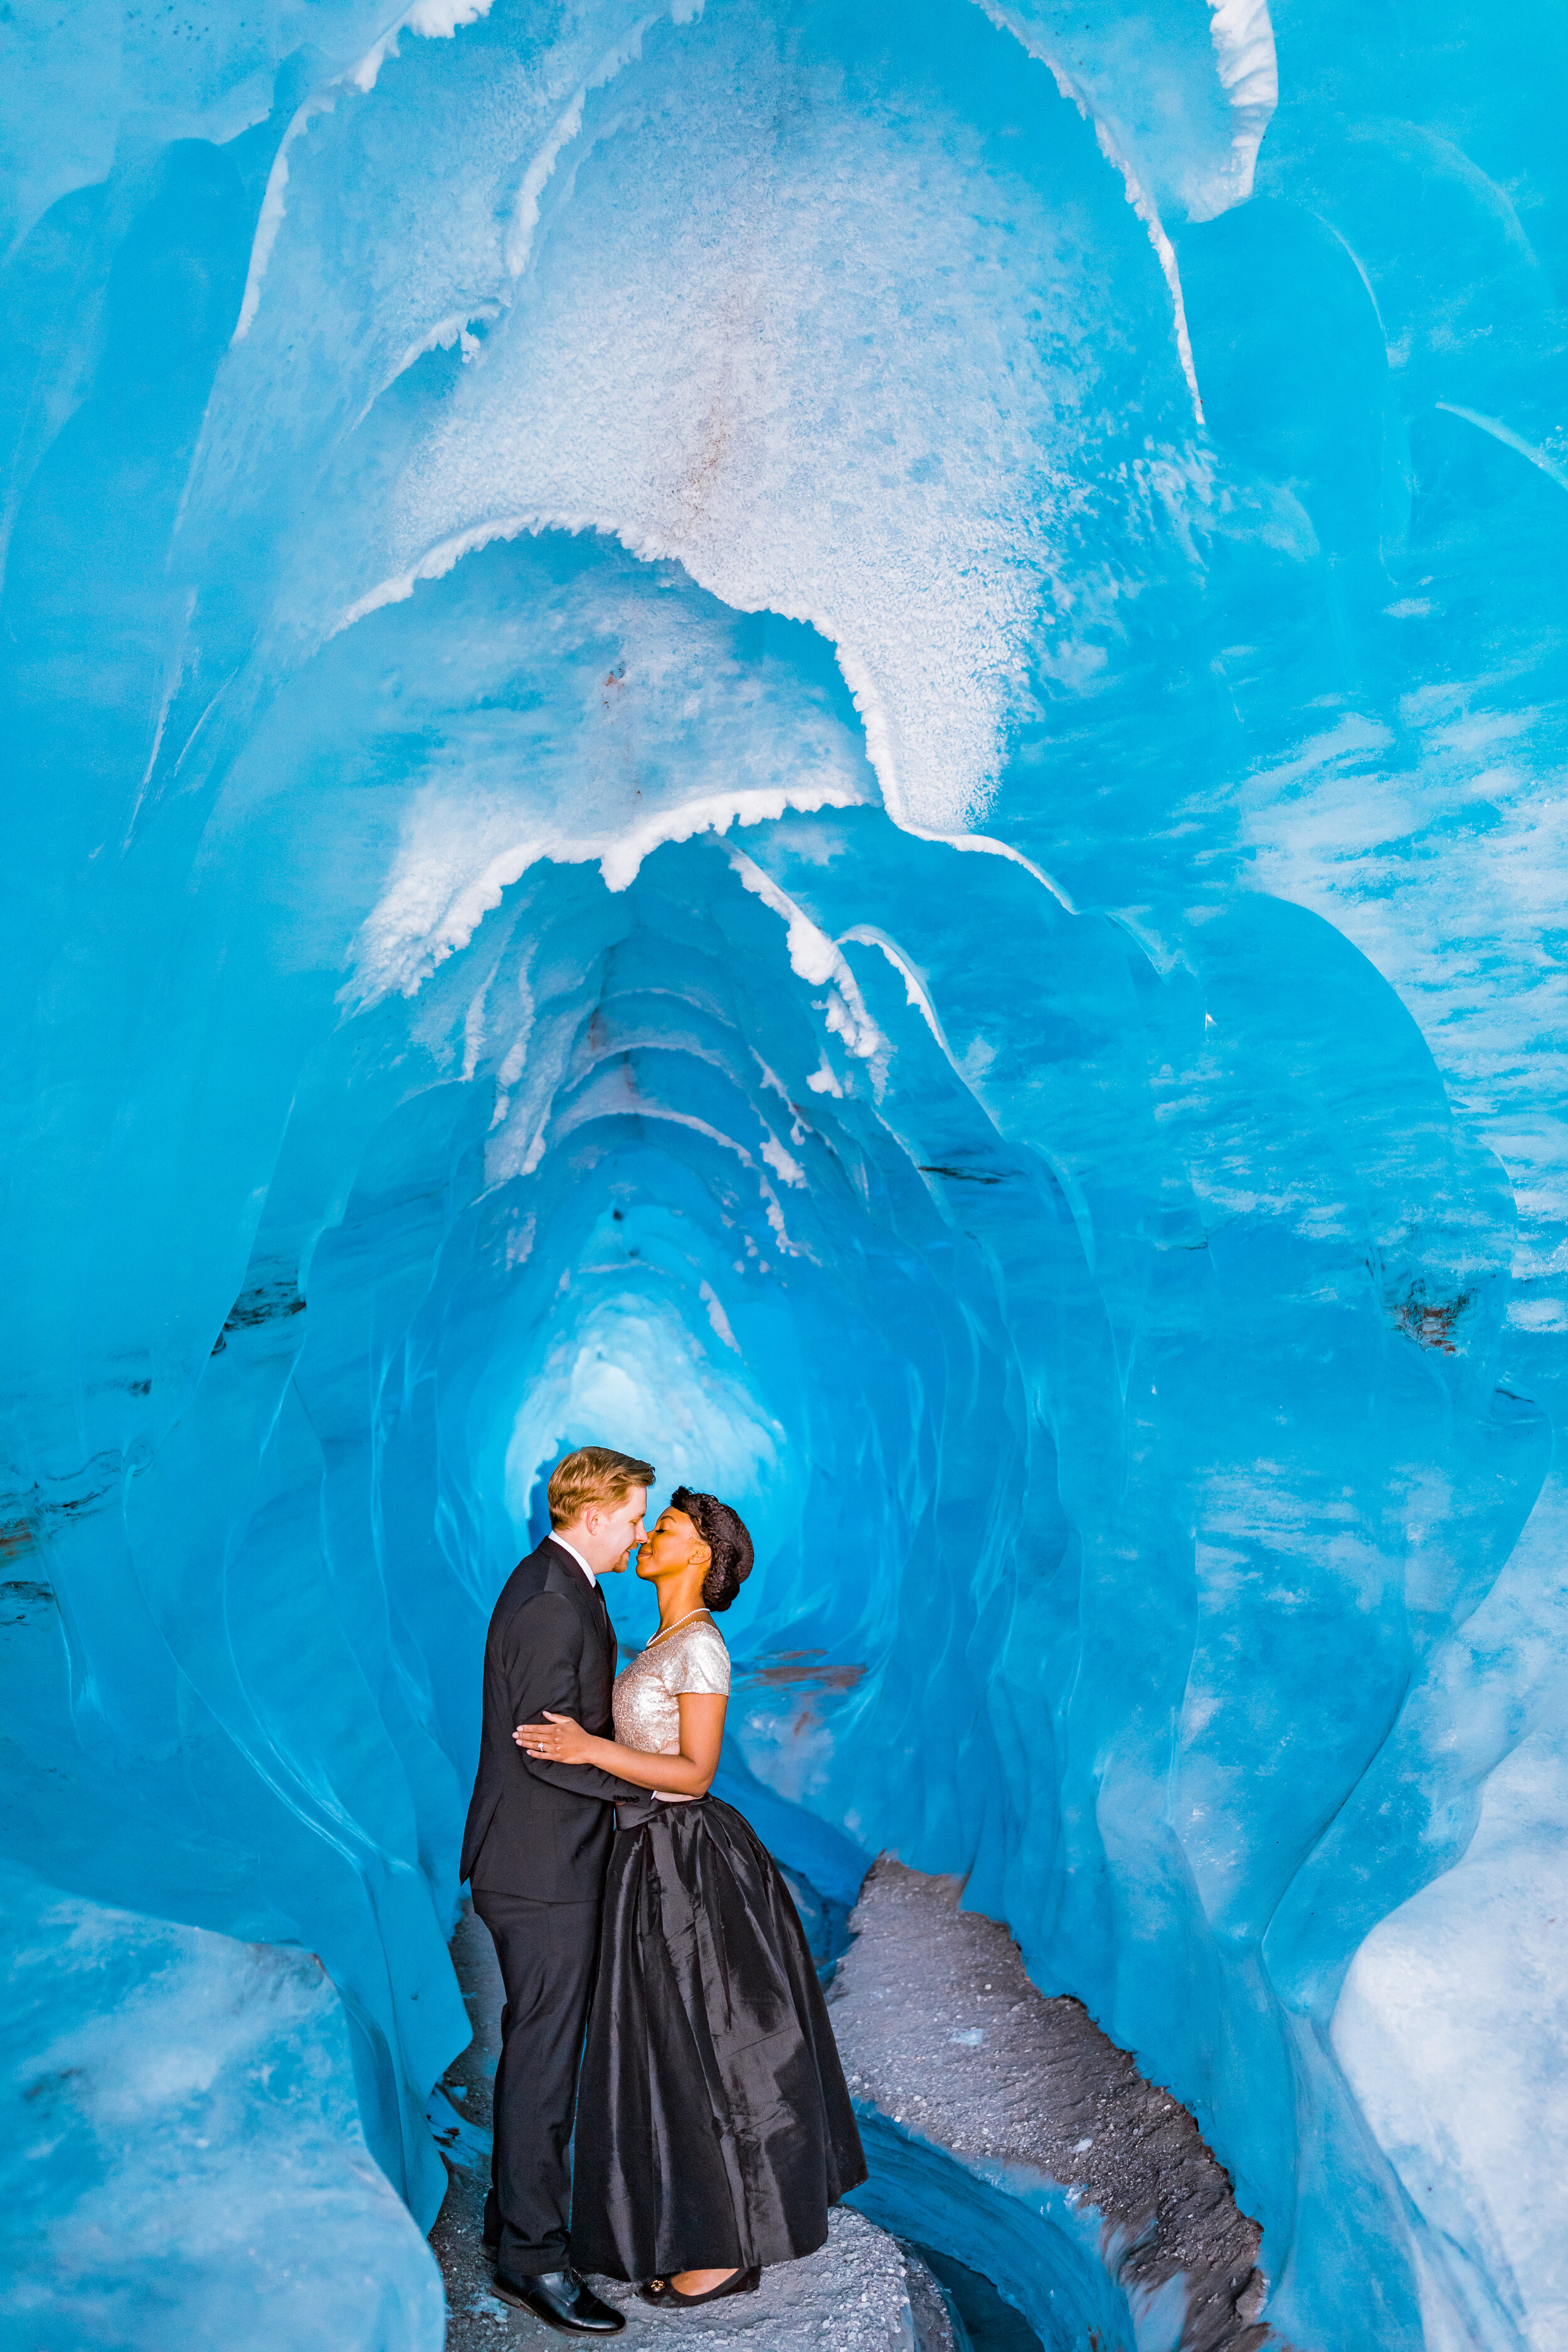 Engagement_Session_Matanuska_Glacier_Alaska_Emily_Lester_Photography-30.jpg